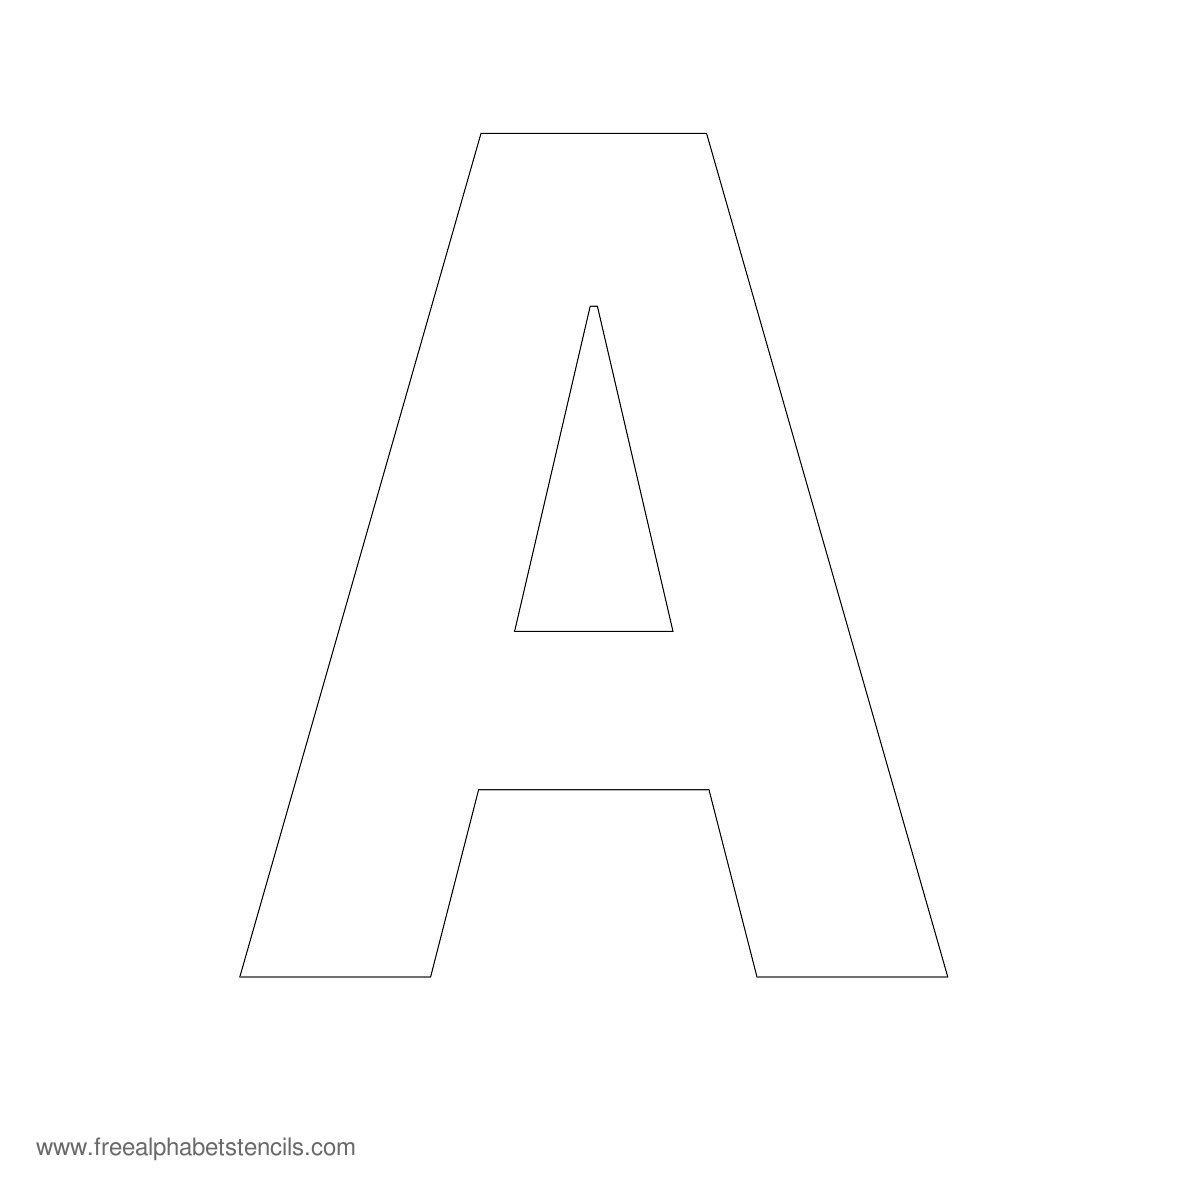 Large Alphabet Stencils | Freealphabetstencils - Free Printable Block Letters